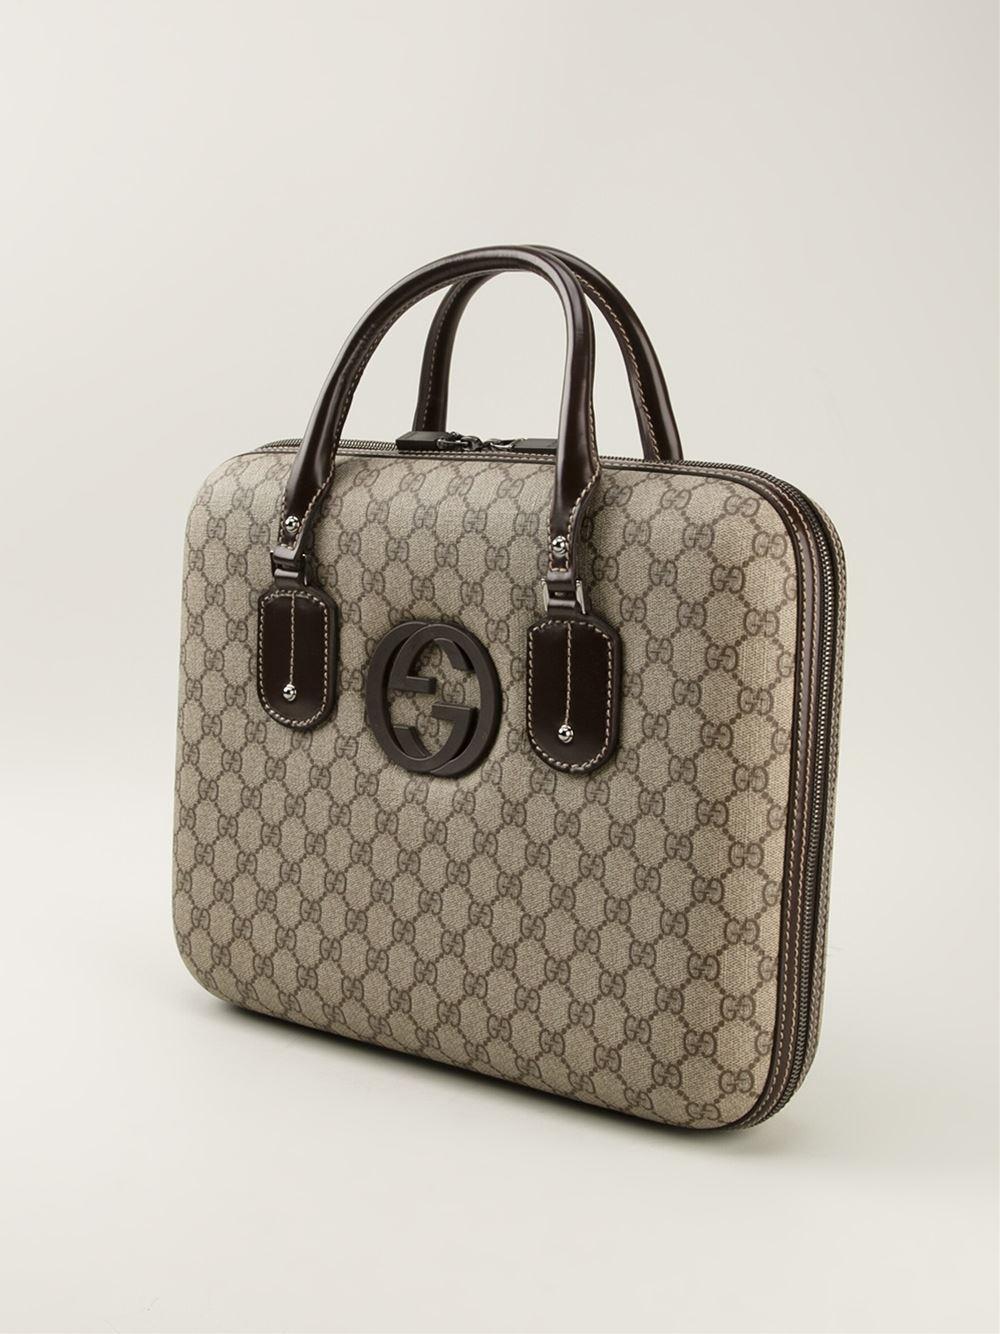 880c034ffd9 Lyst - Gucci Signature Monogram Laptop Bag in Natural